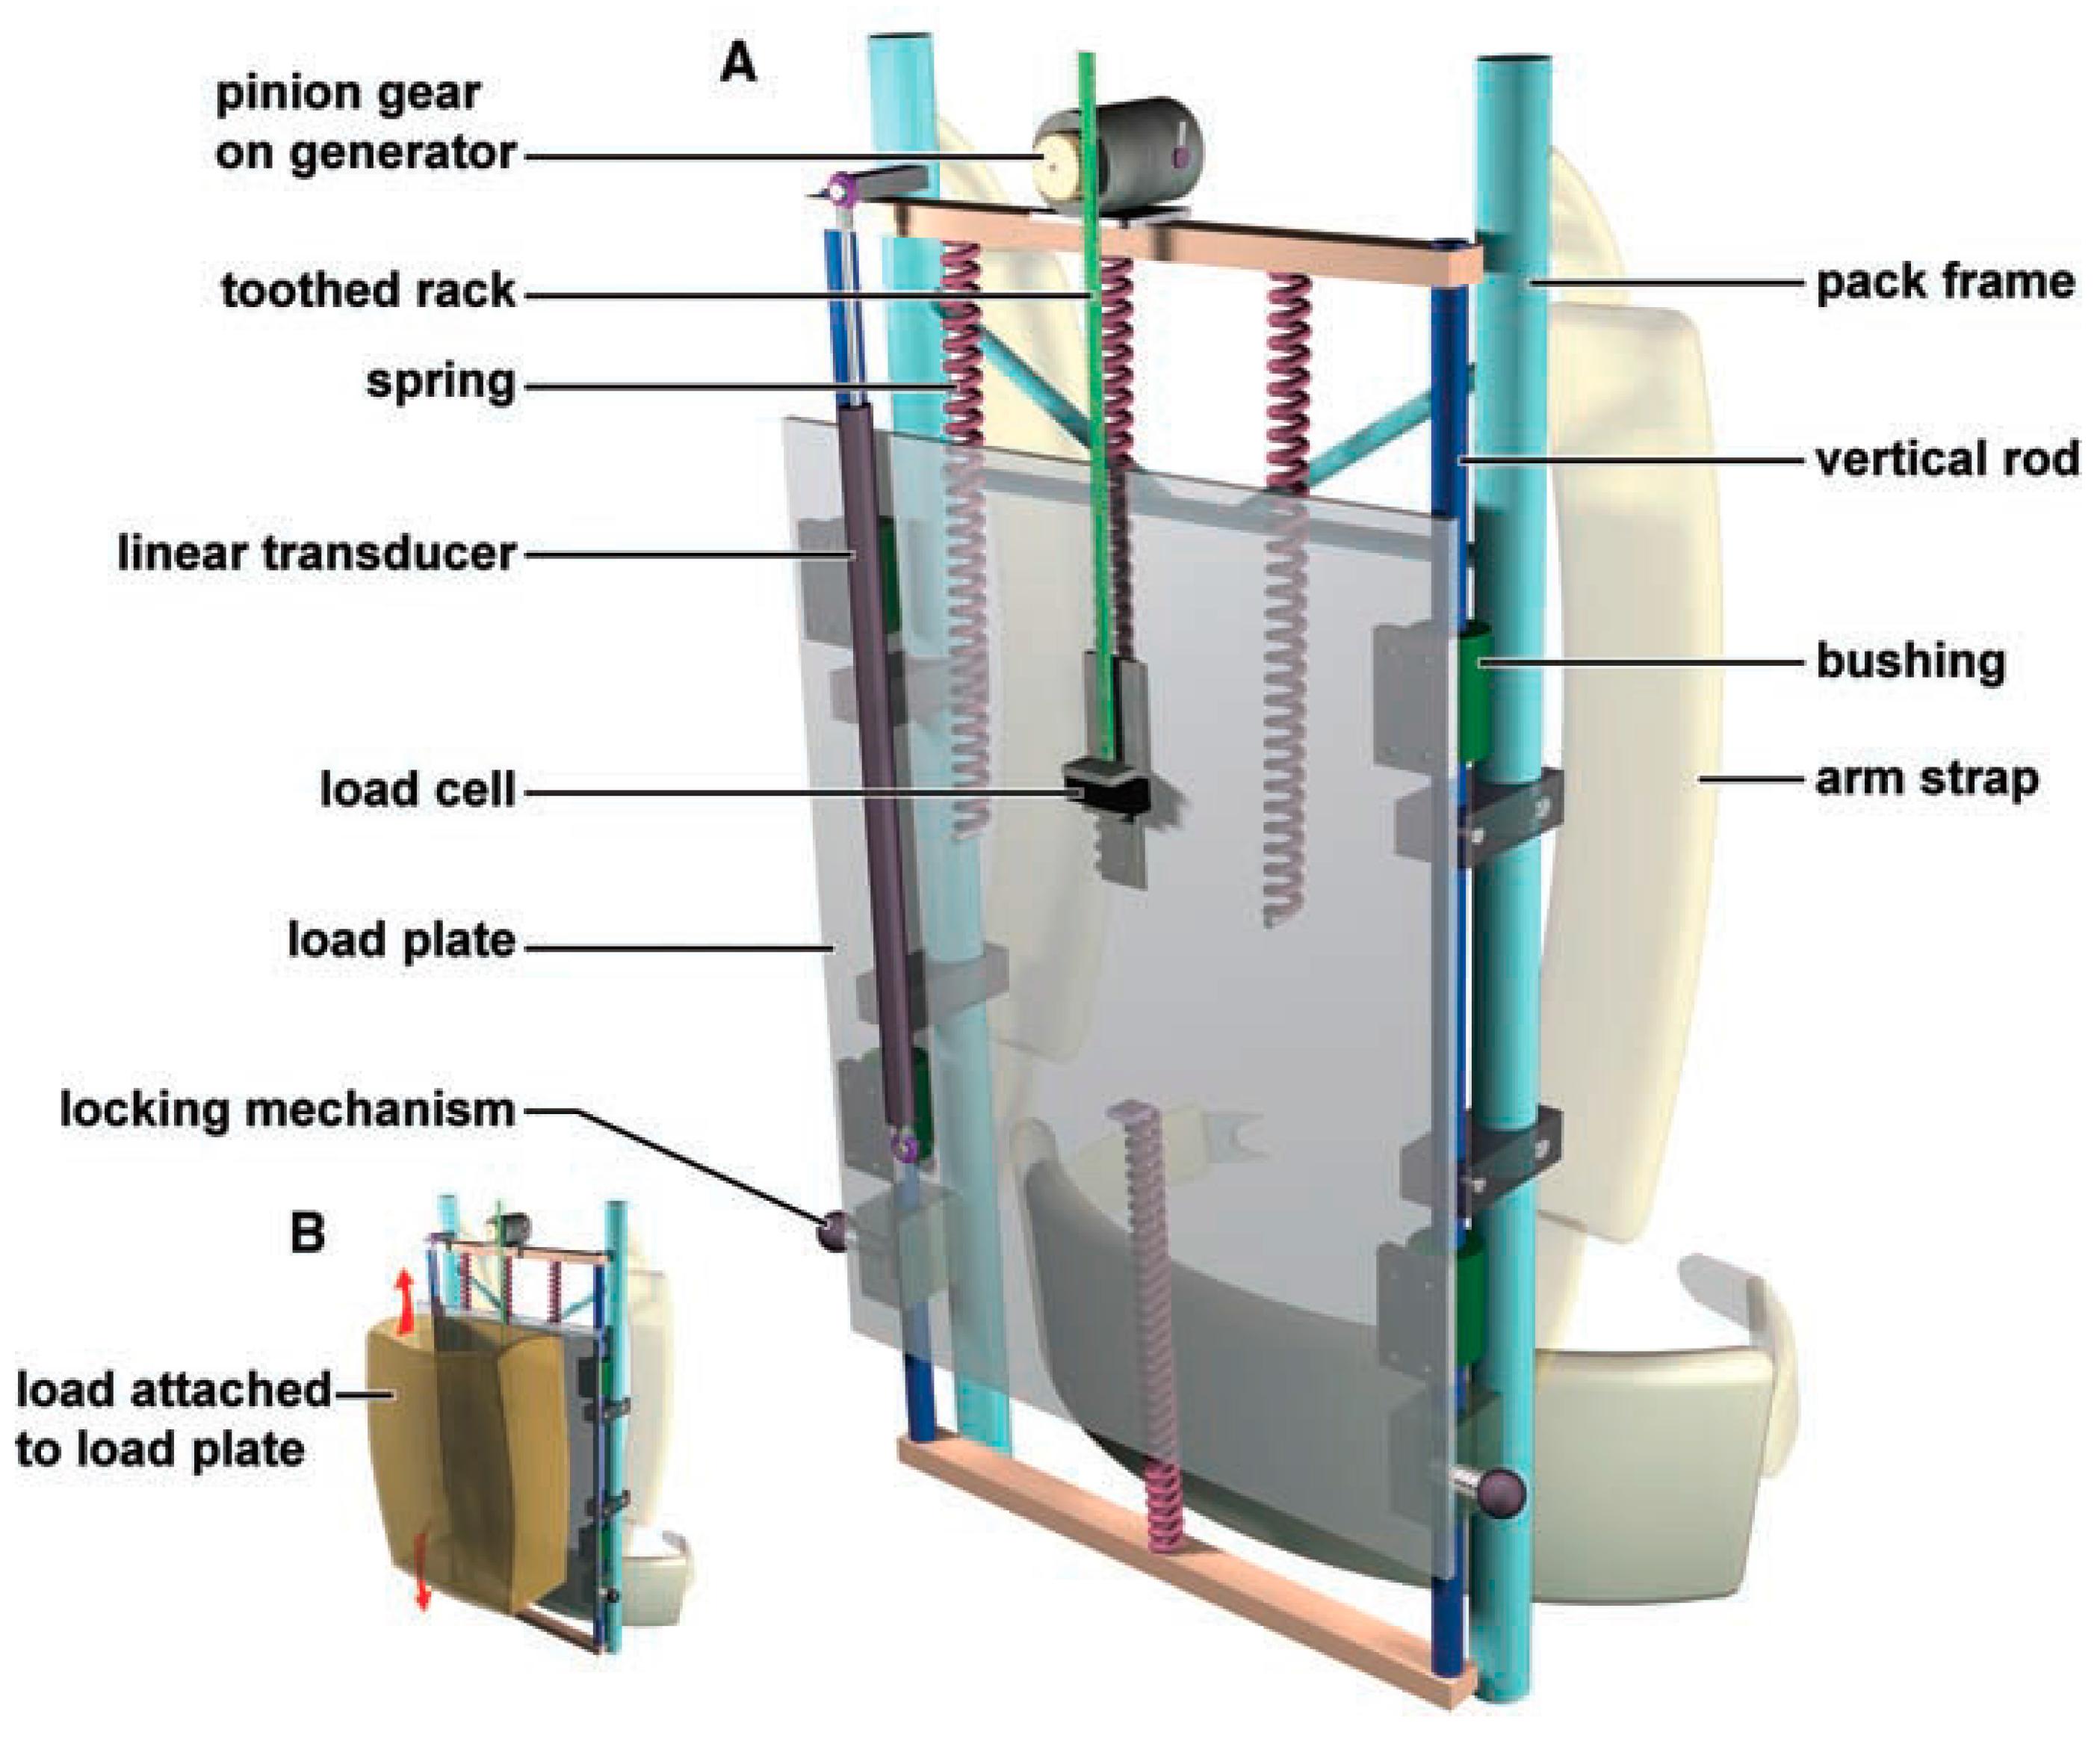 biomechanical mechanism for energy harvesting from